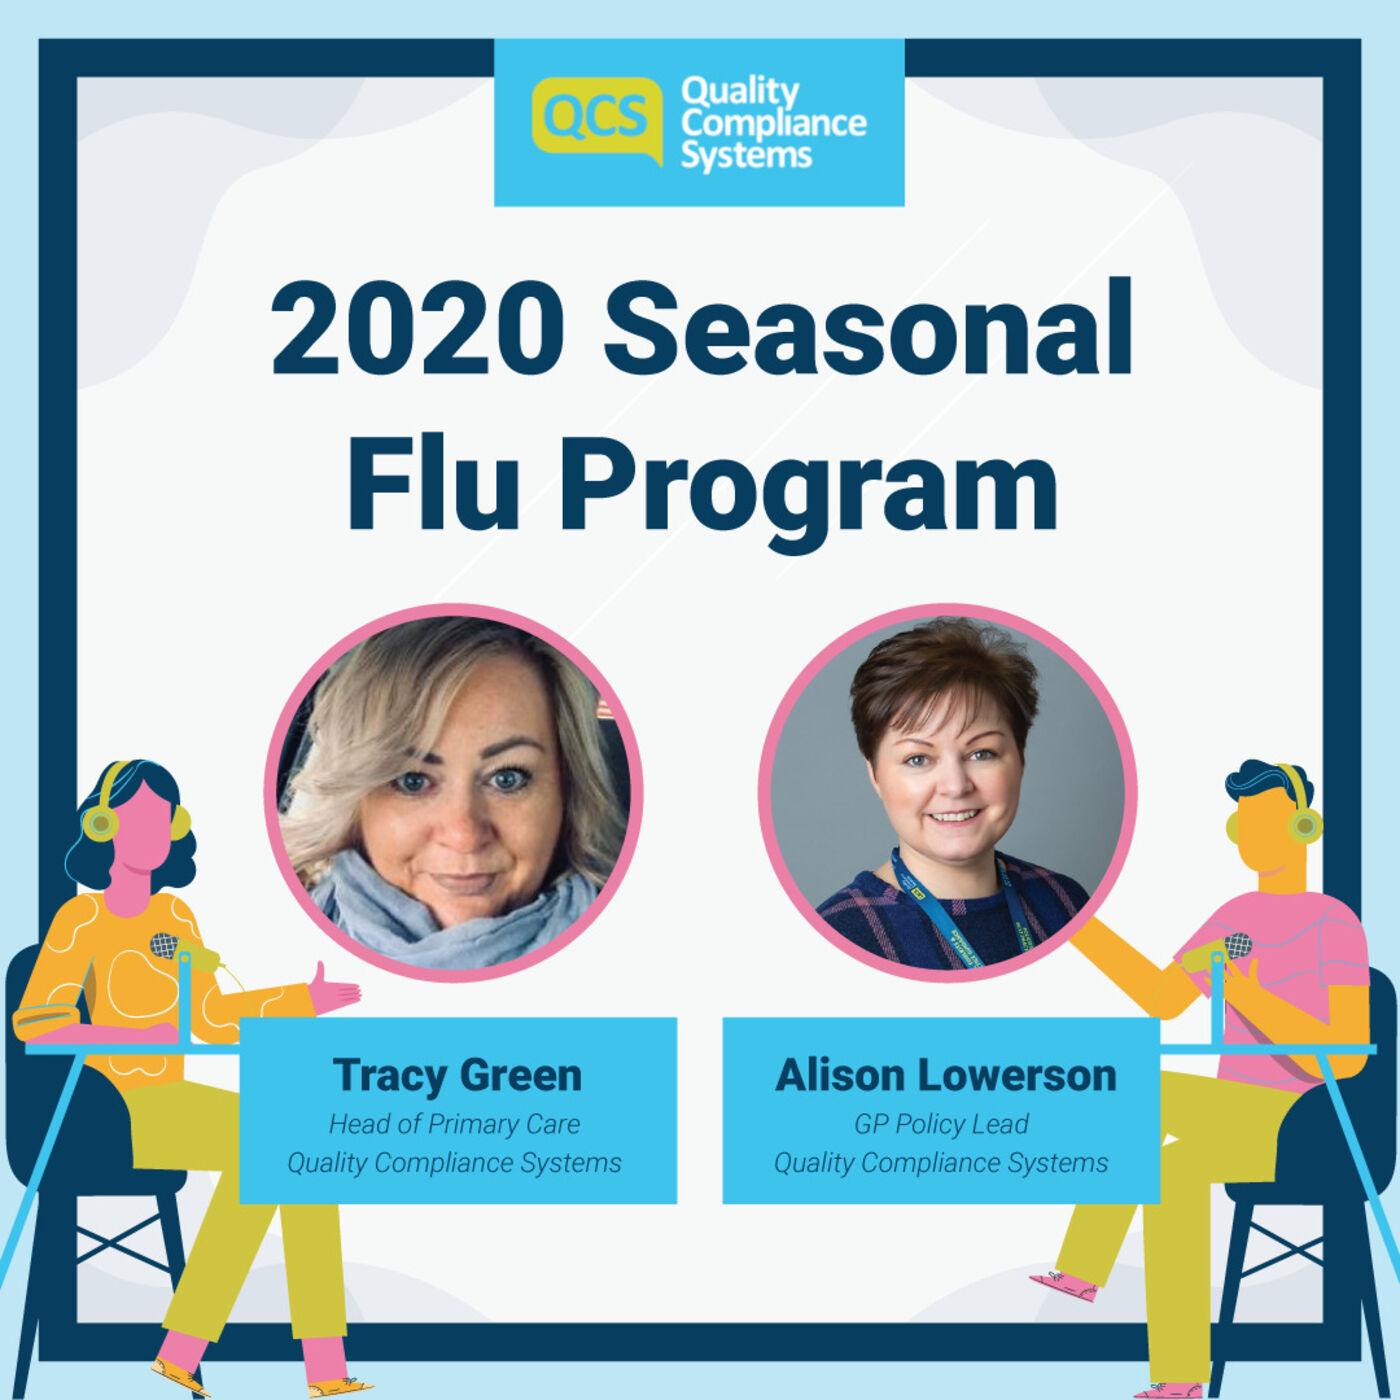 The 2020 Seasonal Flu Programme